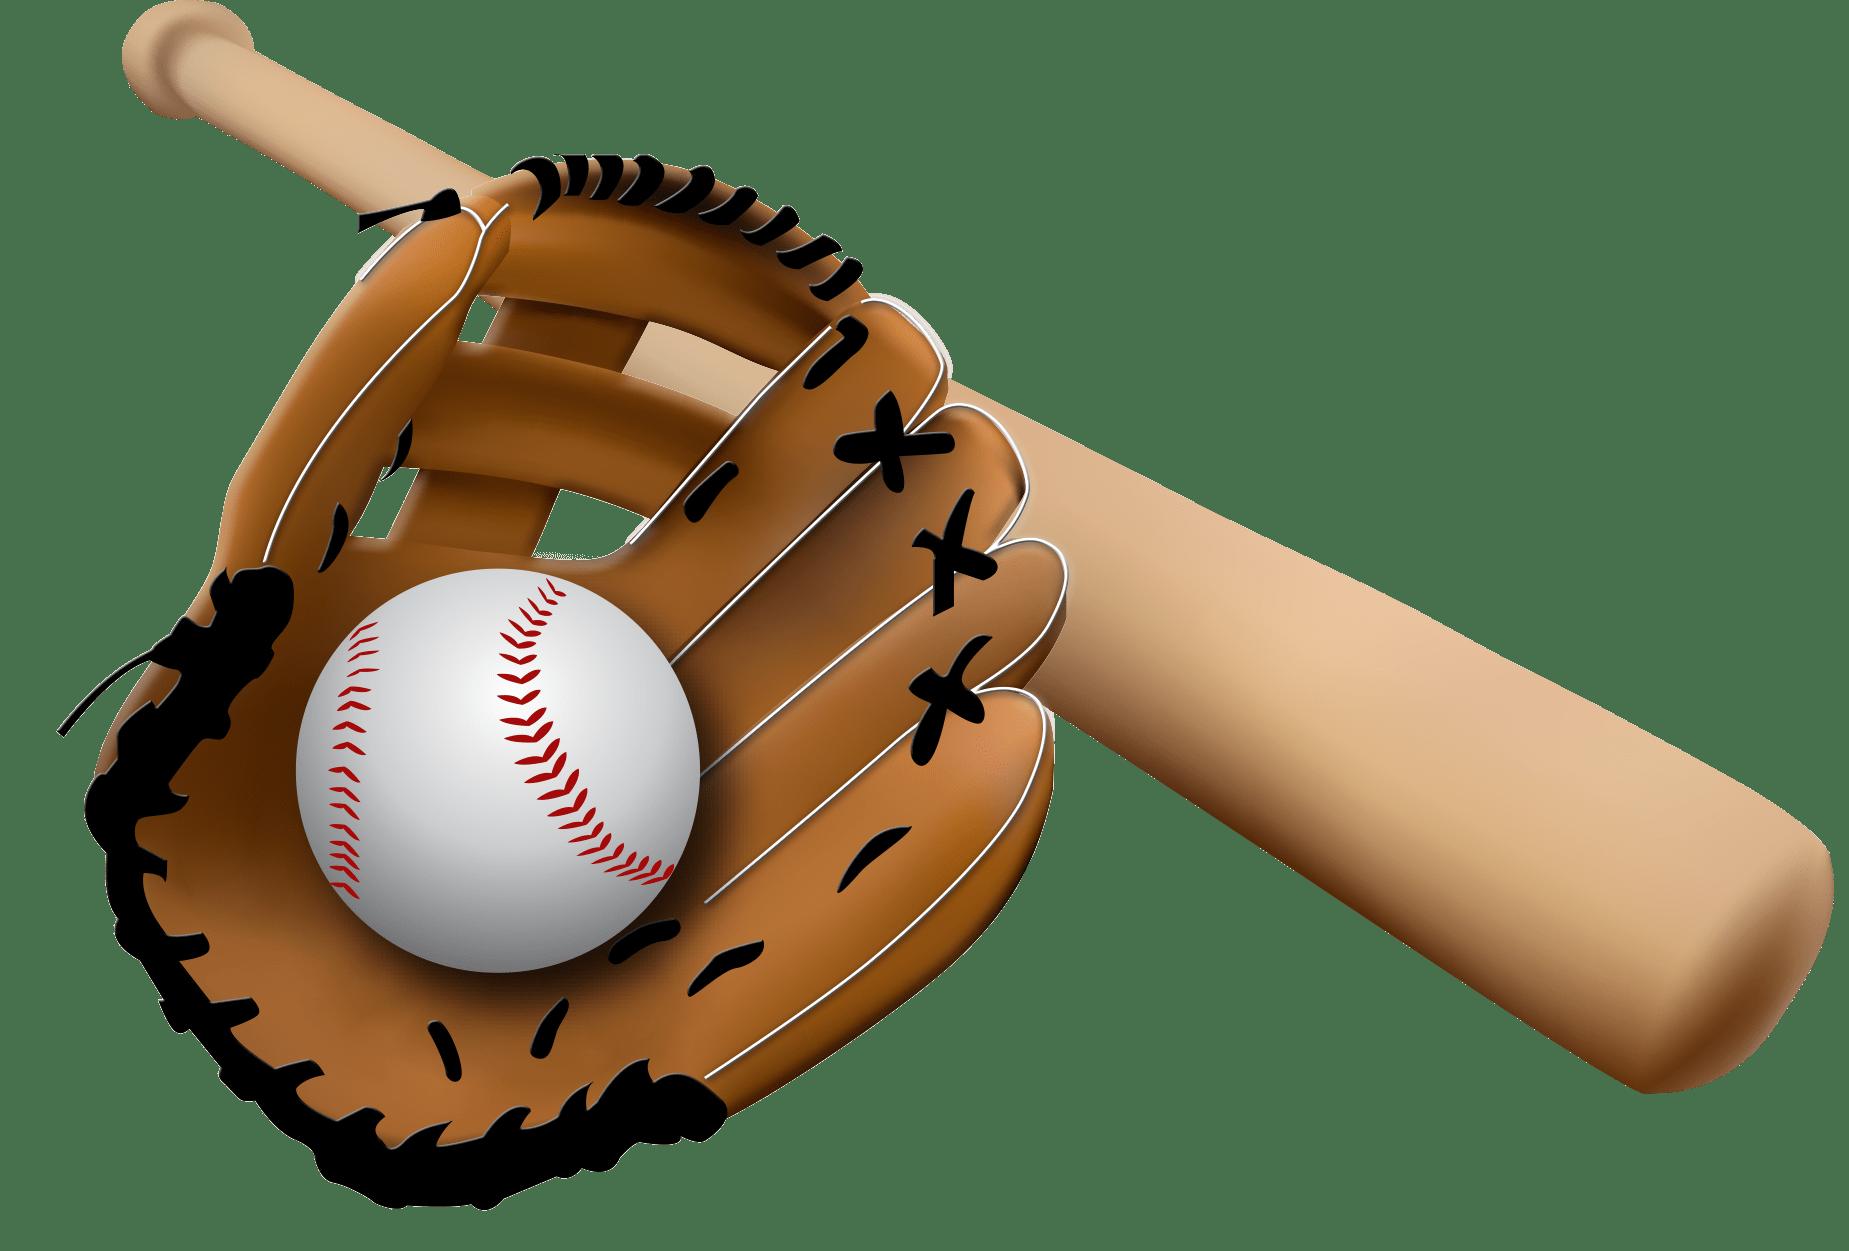 Gloves clipart transparent background. Baseball glove and bat